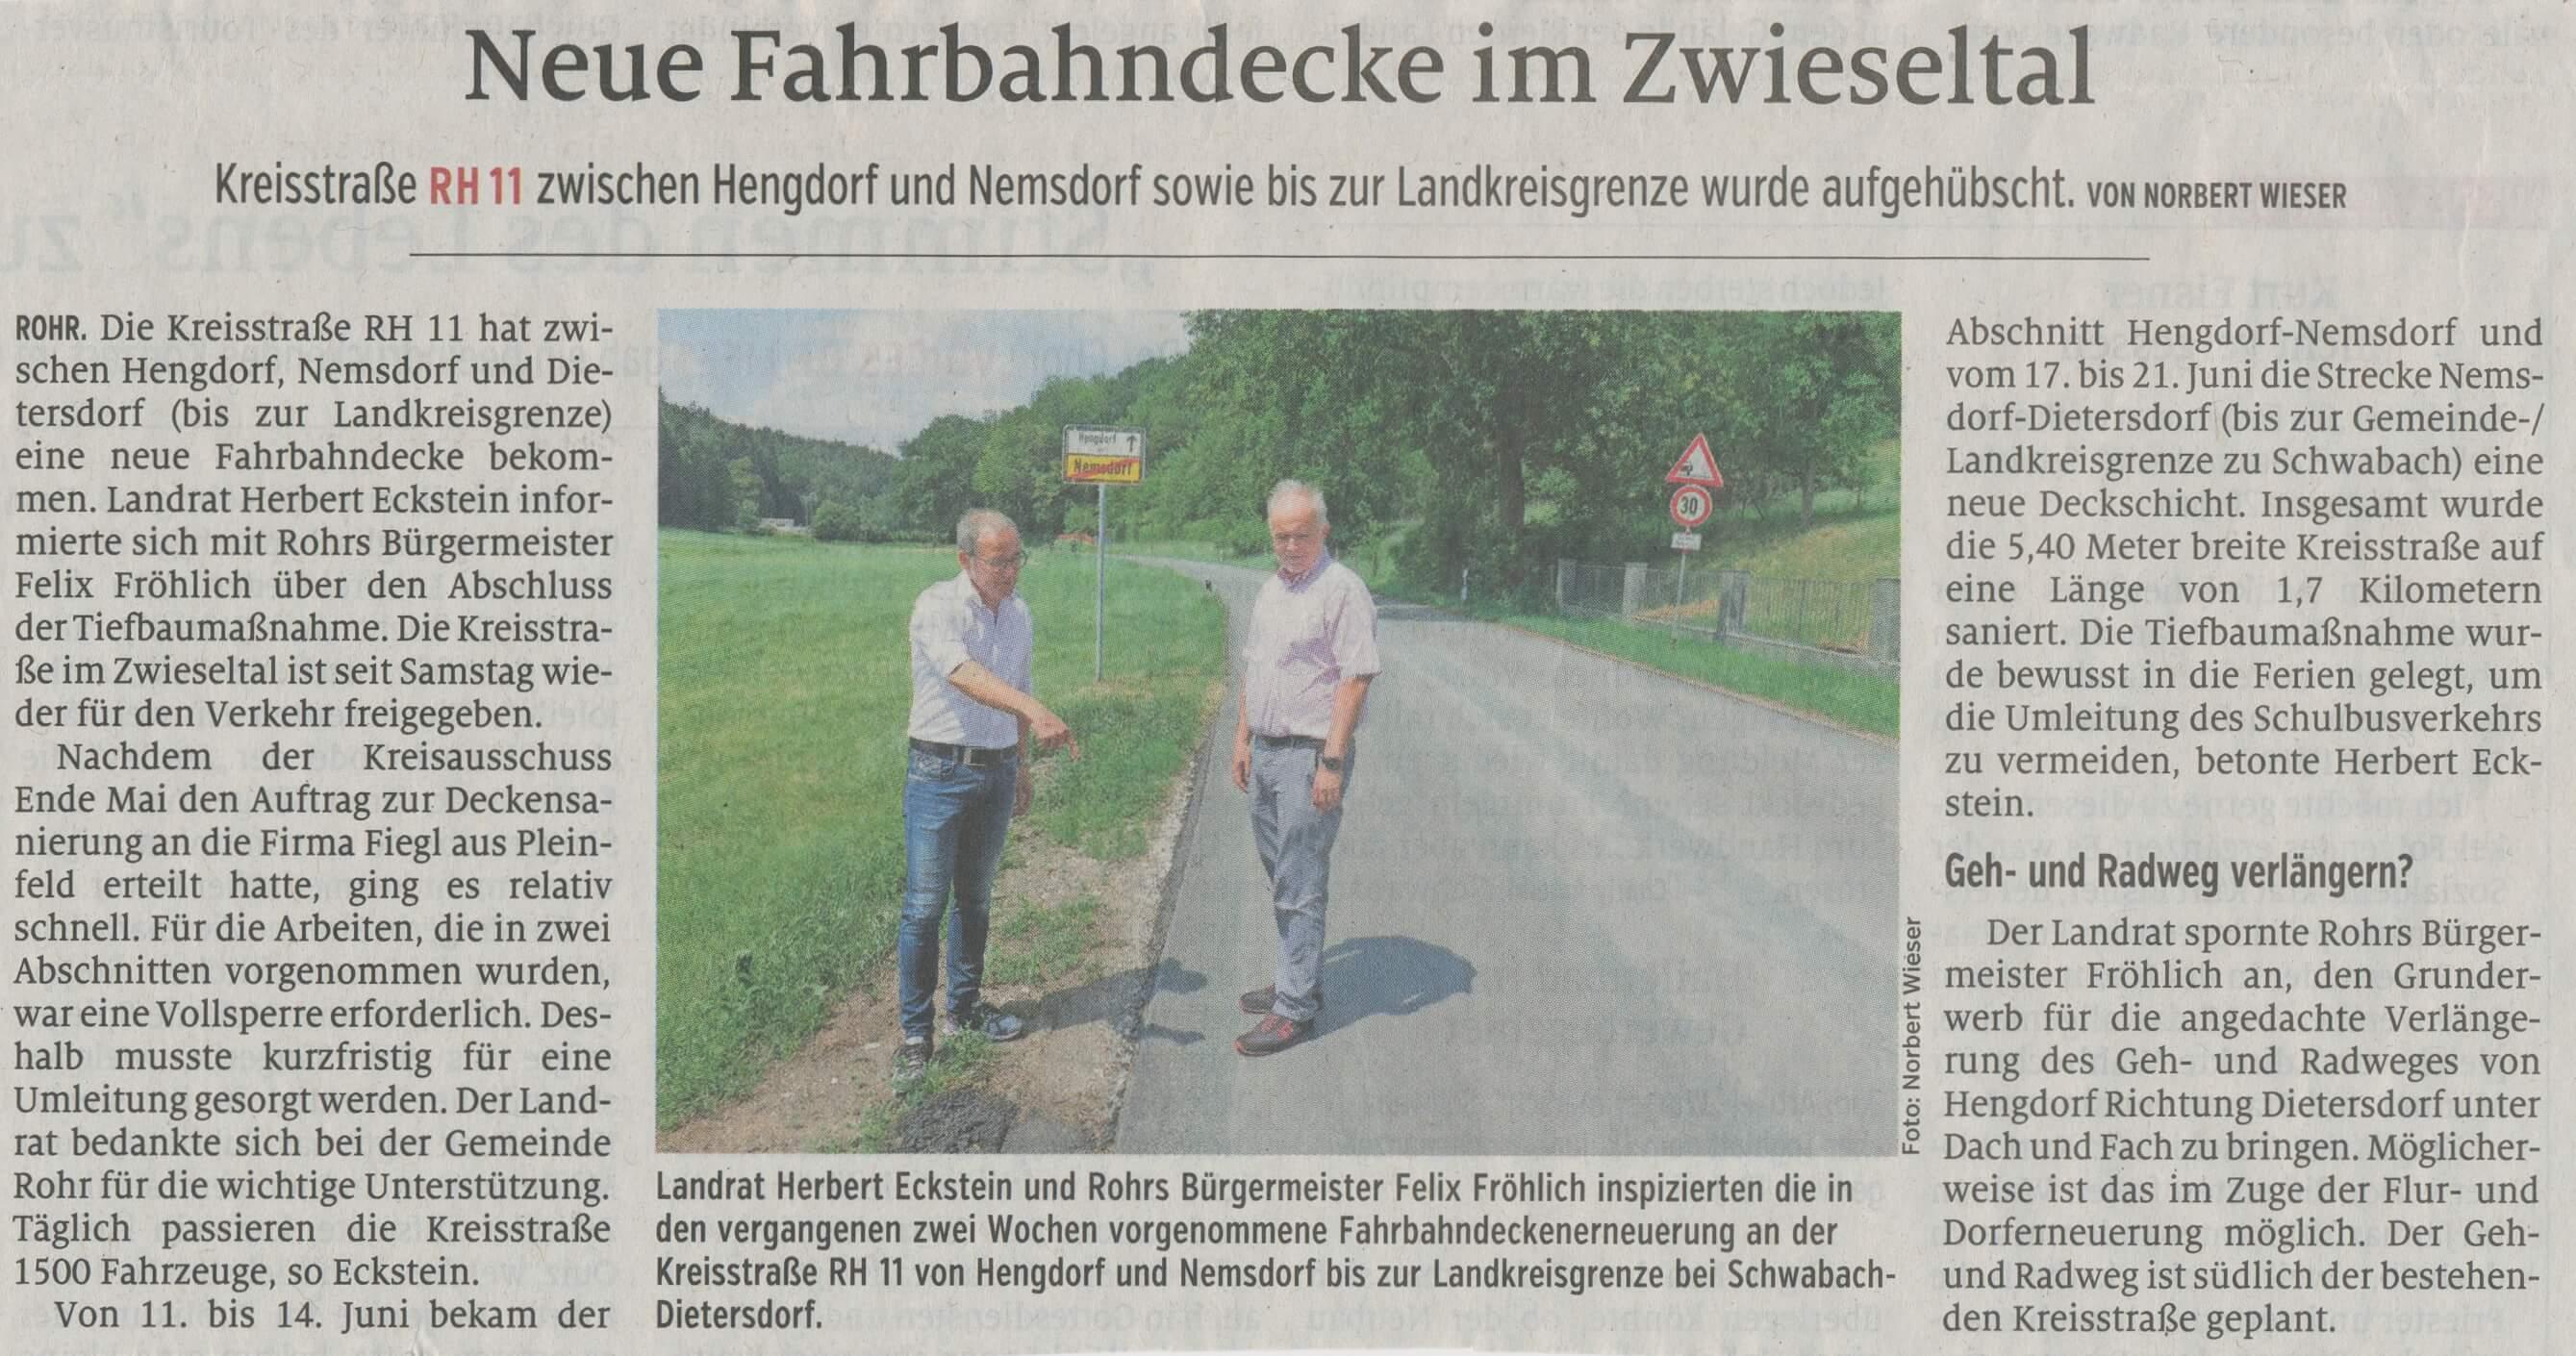 25.06.2019 Neue Fahrbahndecke im Zwieseltal - Schwabacher Tagblatt